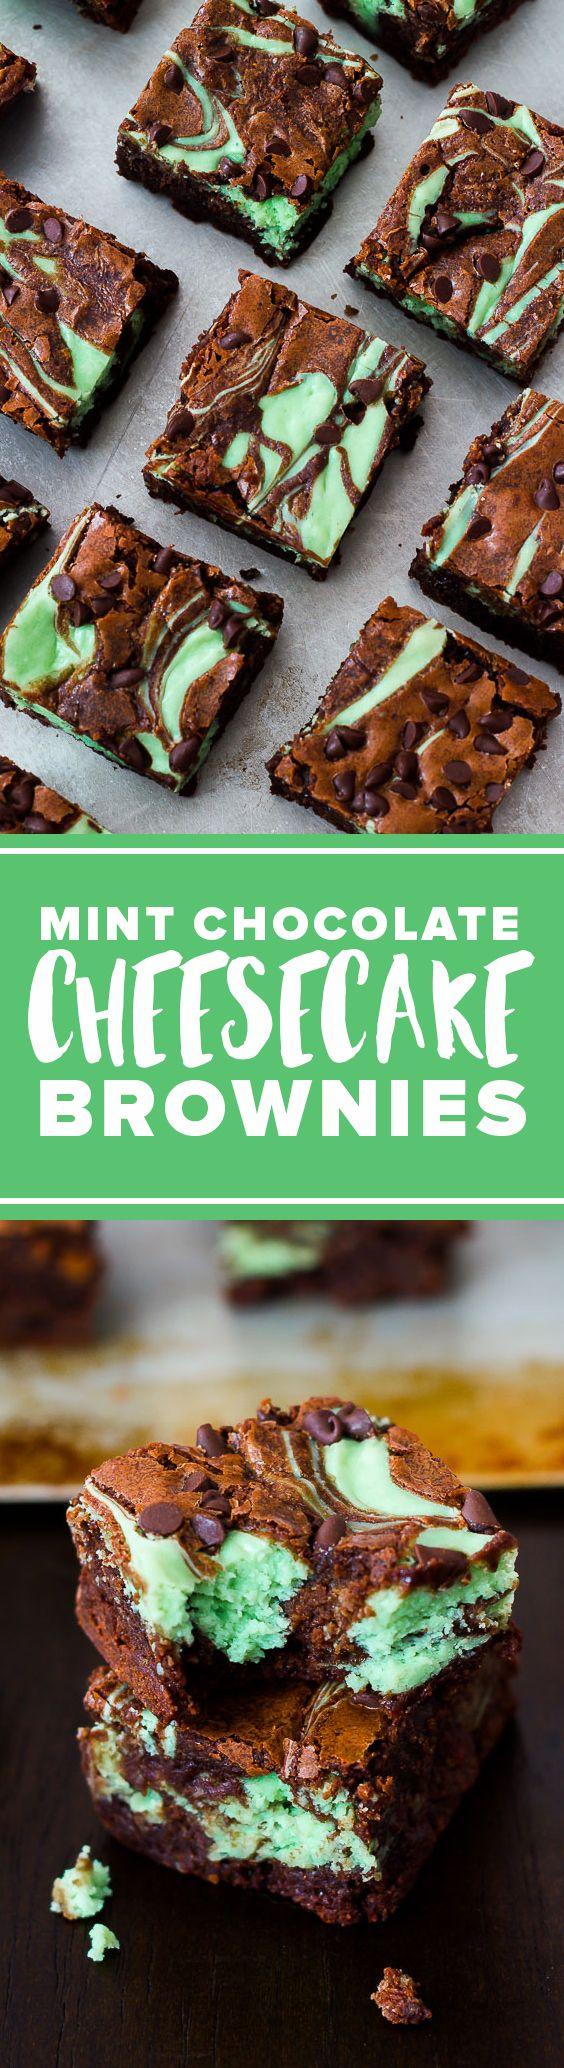 Homemade brownies with mint chocolate cheesecake swirl! Cheesecake swirl brownies recipe on http://sallysbakingaddiction.com/2013/03/10/mint-chocolate-chip-cheesecake-brownies/